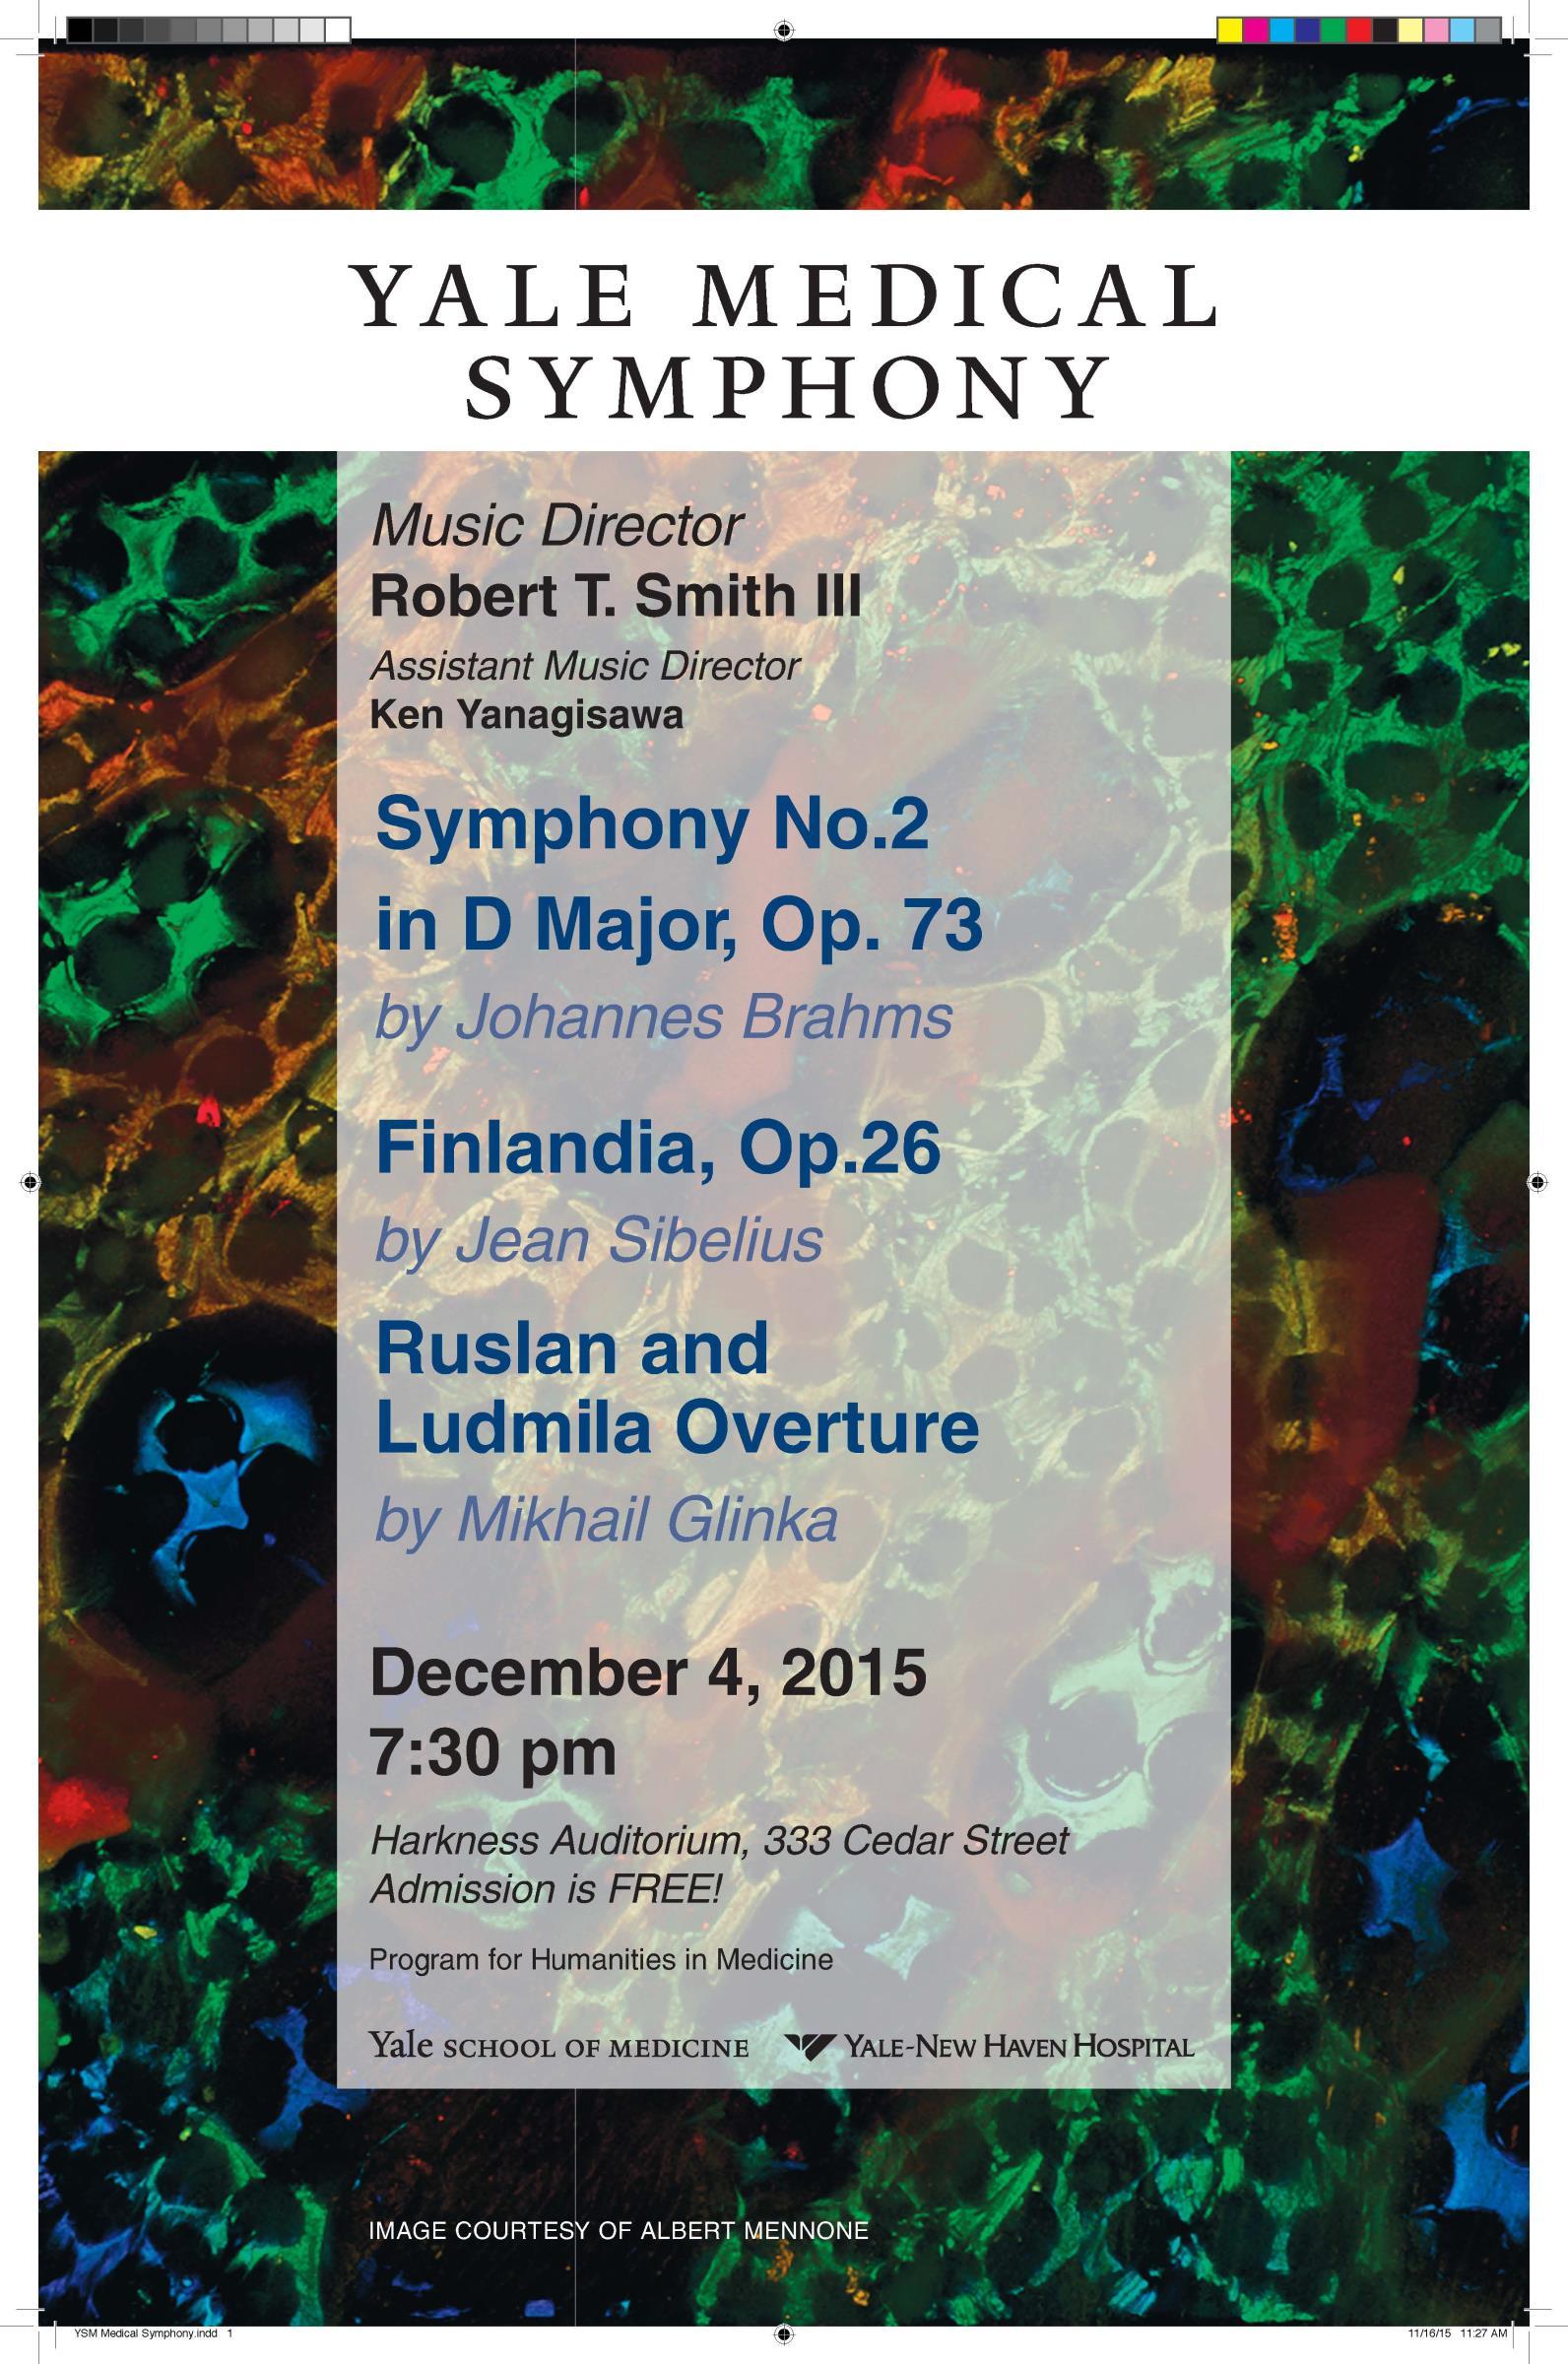 Yale Medical Symphony: Winter 2015